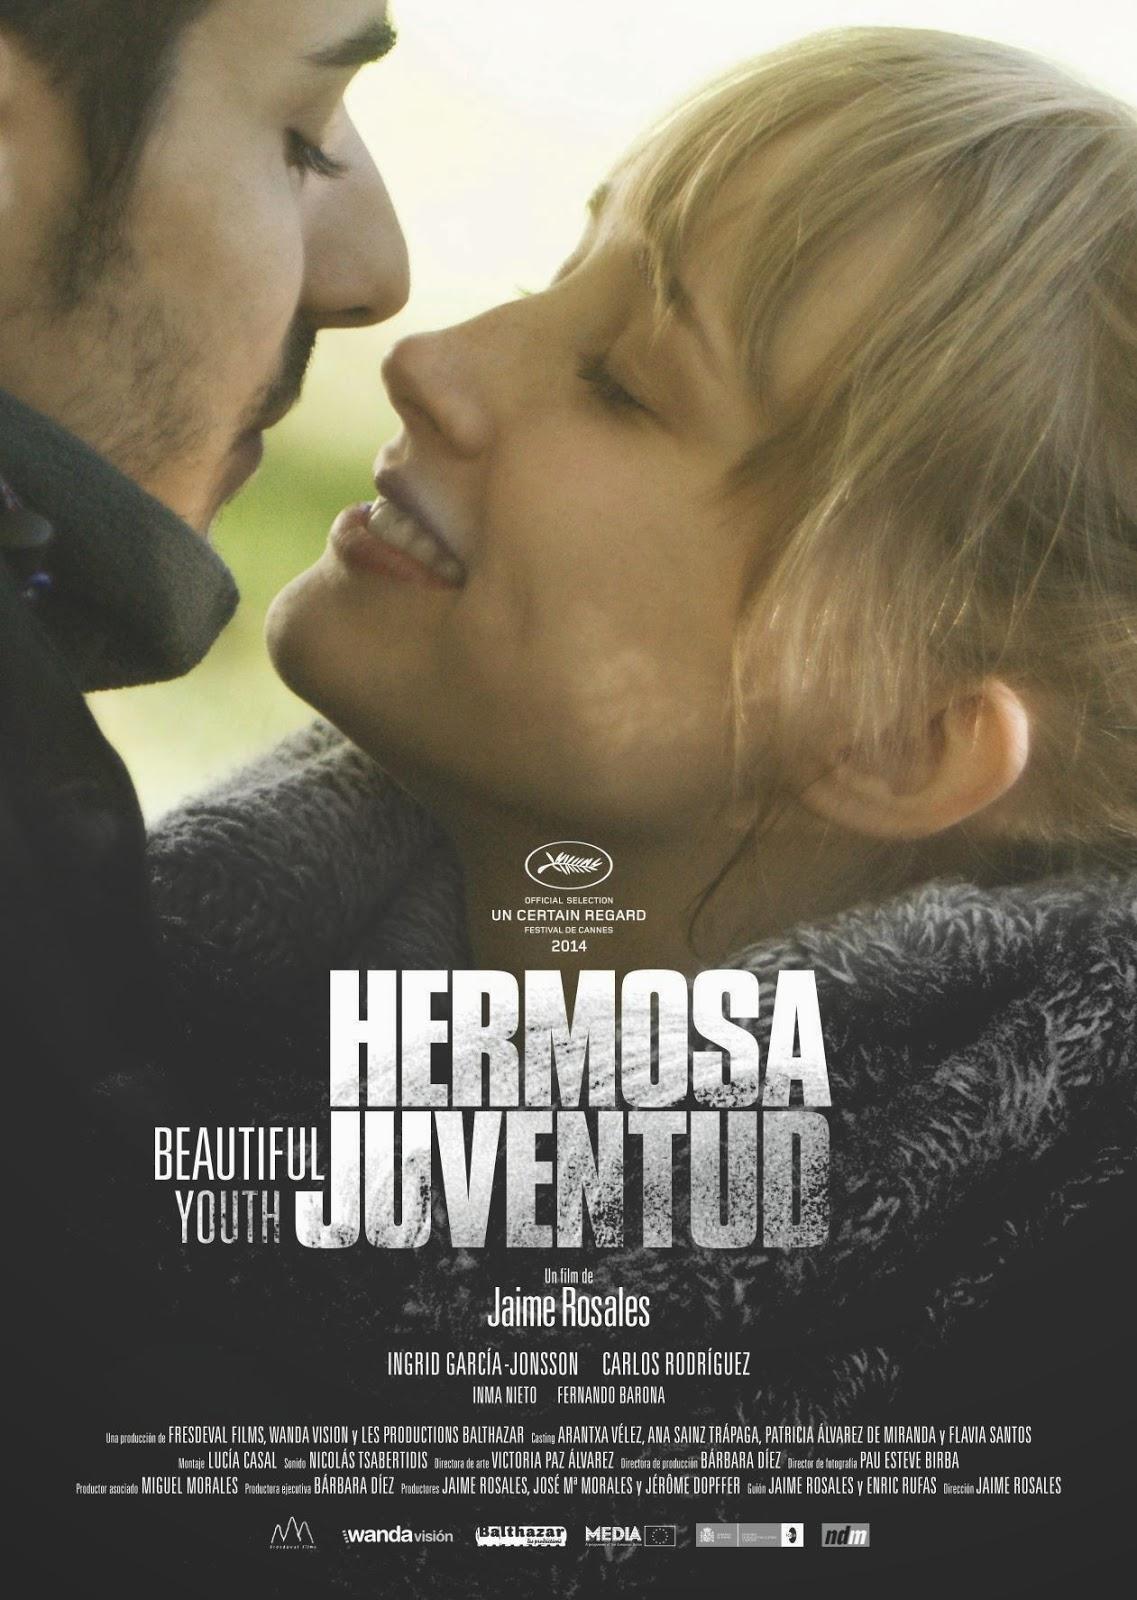 Hermosa juventud - Beautiful Youth (2014) ταινιες online seires xrysoi greek subs